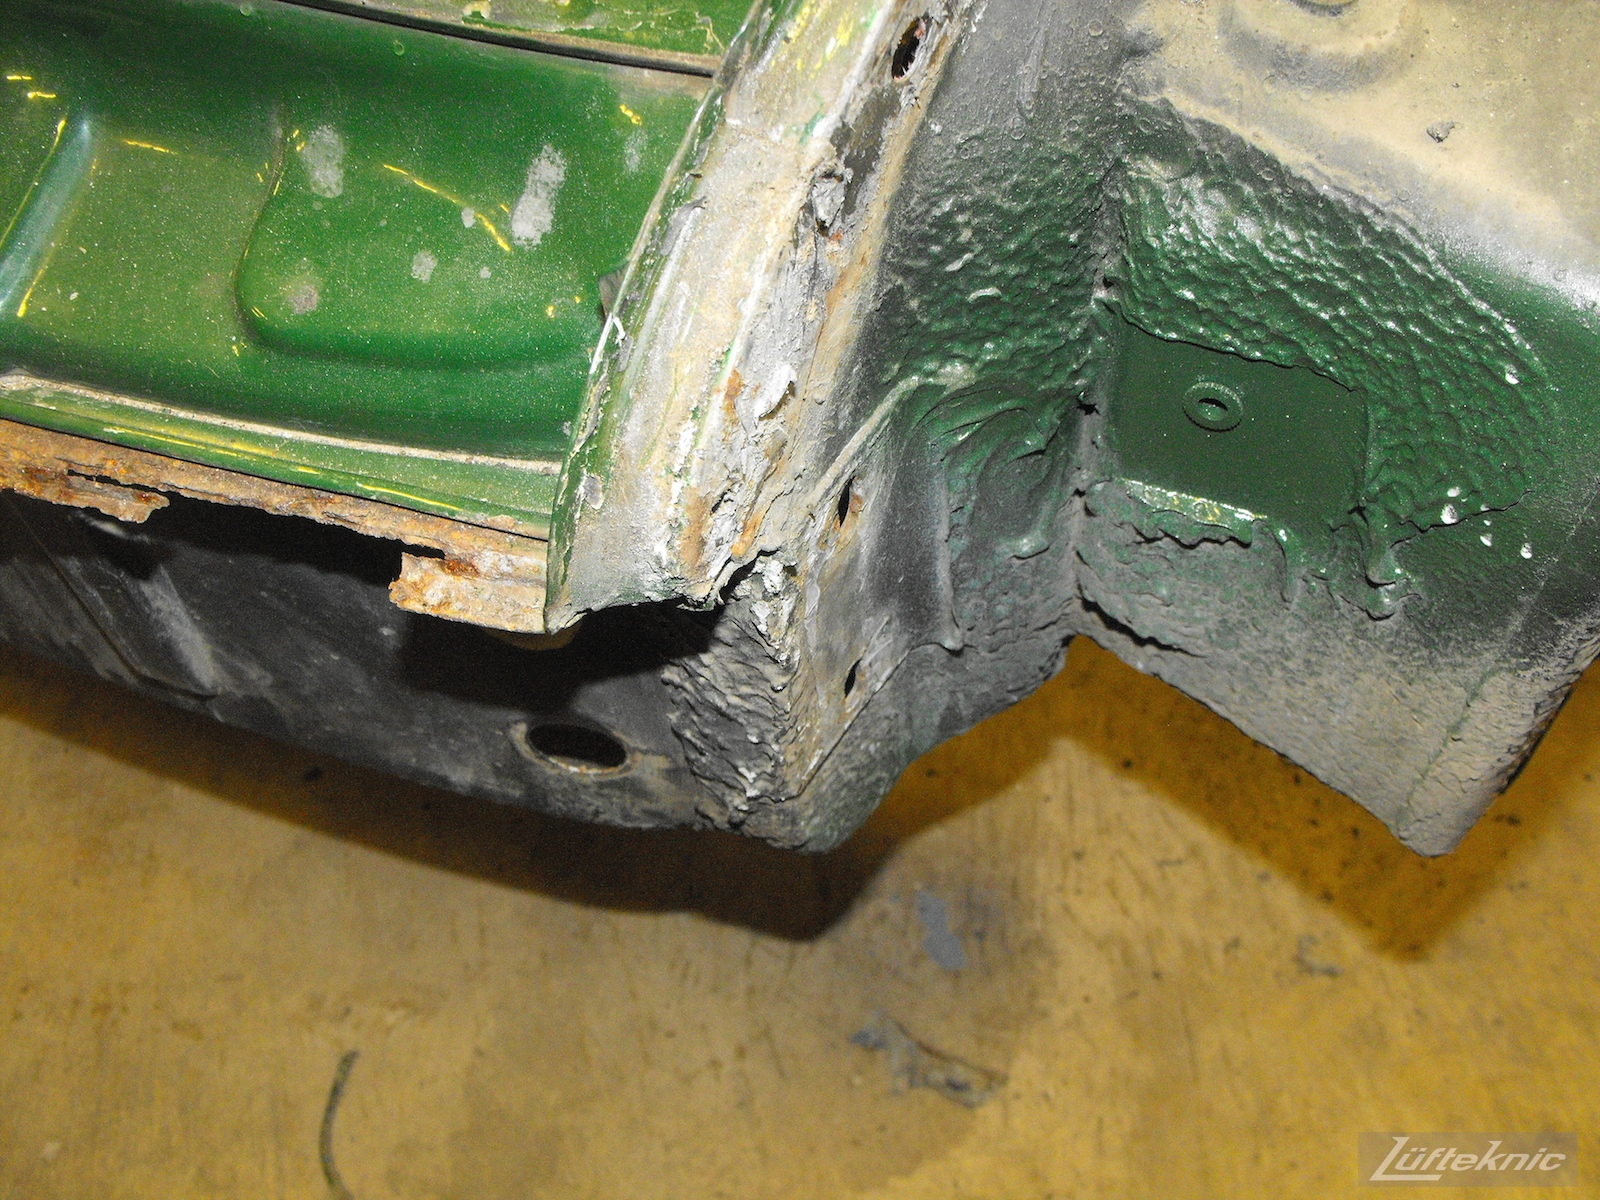 Front pan damage on an Irish Green Porsche 912 undergoing restoration at Lufteknic.